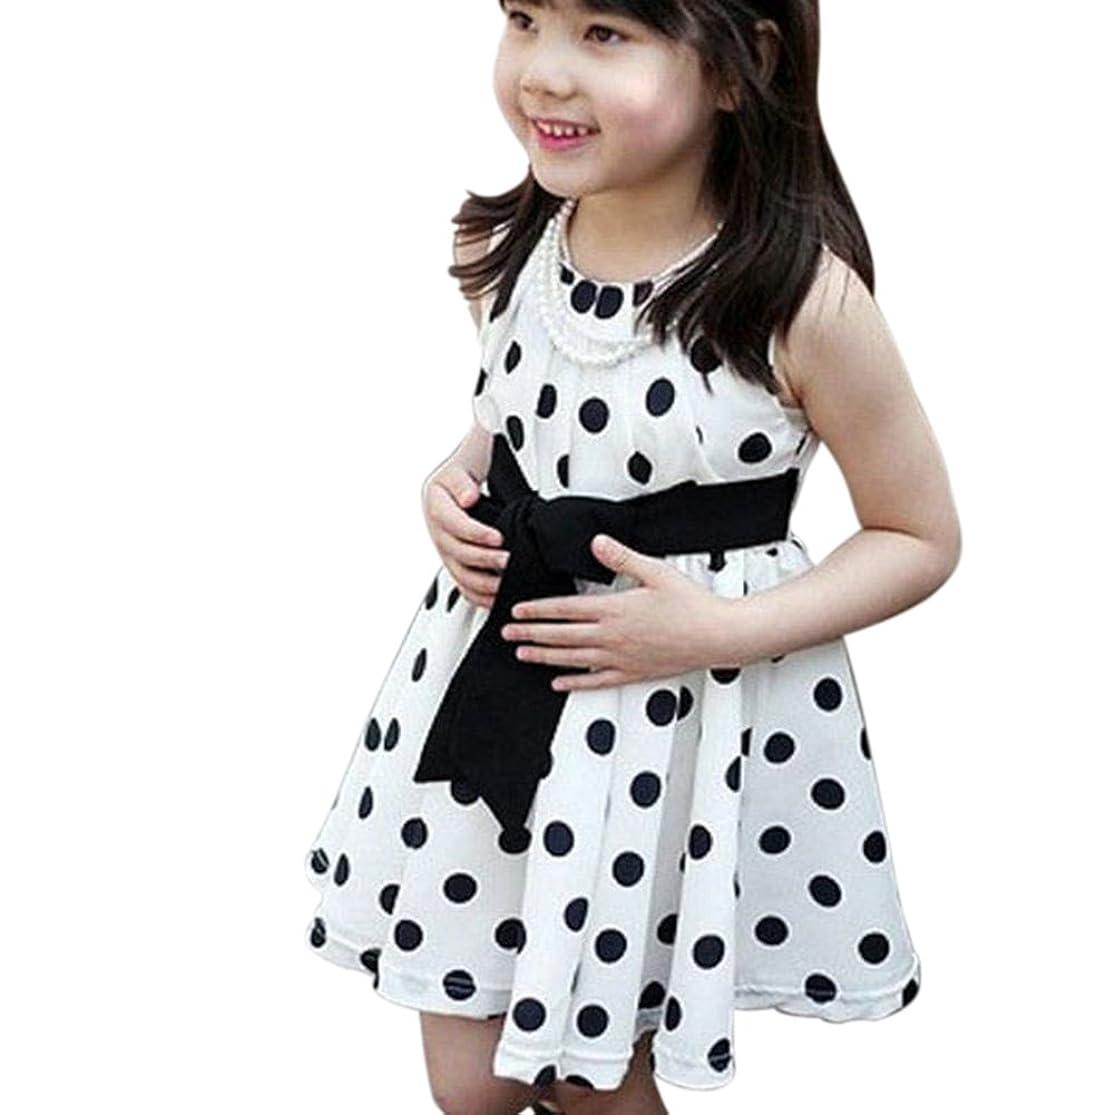 Weixinbuy Kids Girls Polka Dot Chiffion Sundress Bowknot Belt Dress yuenxoxi1